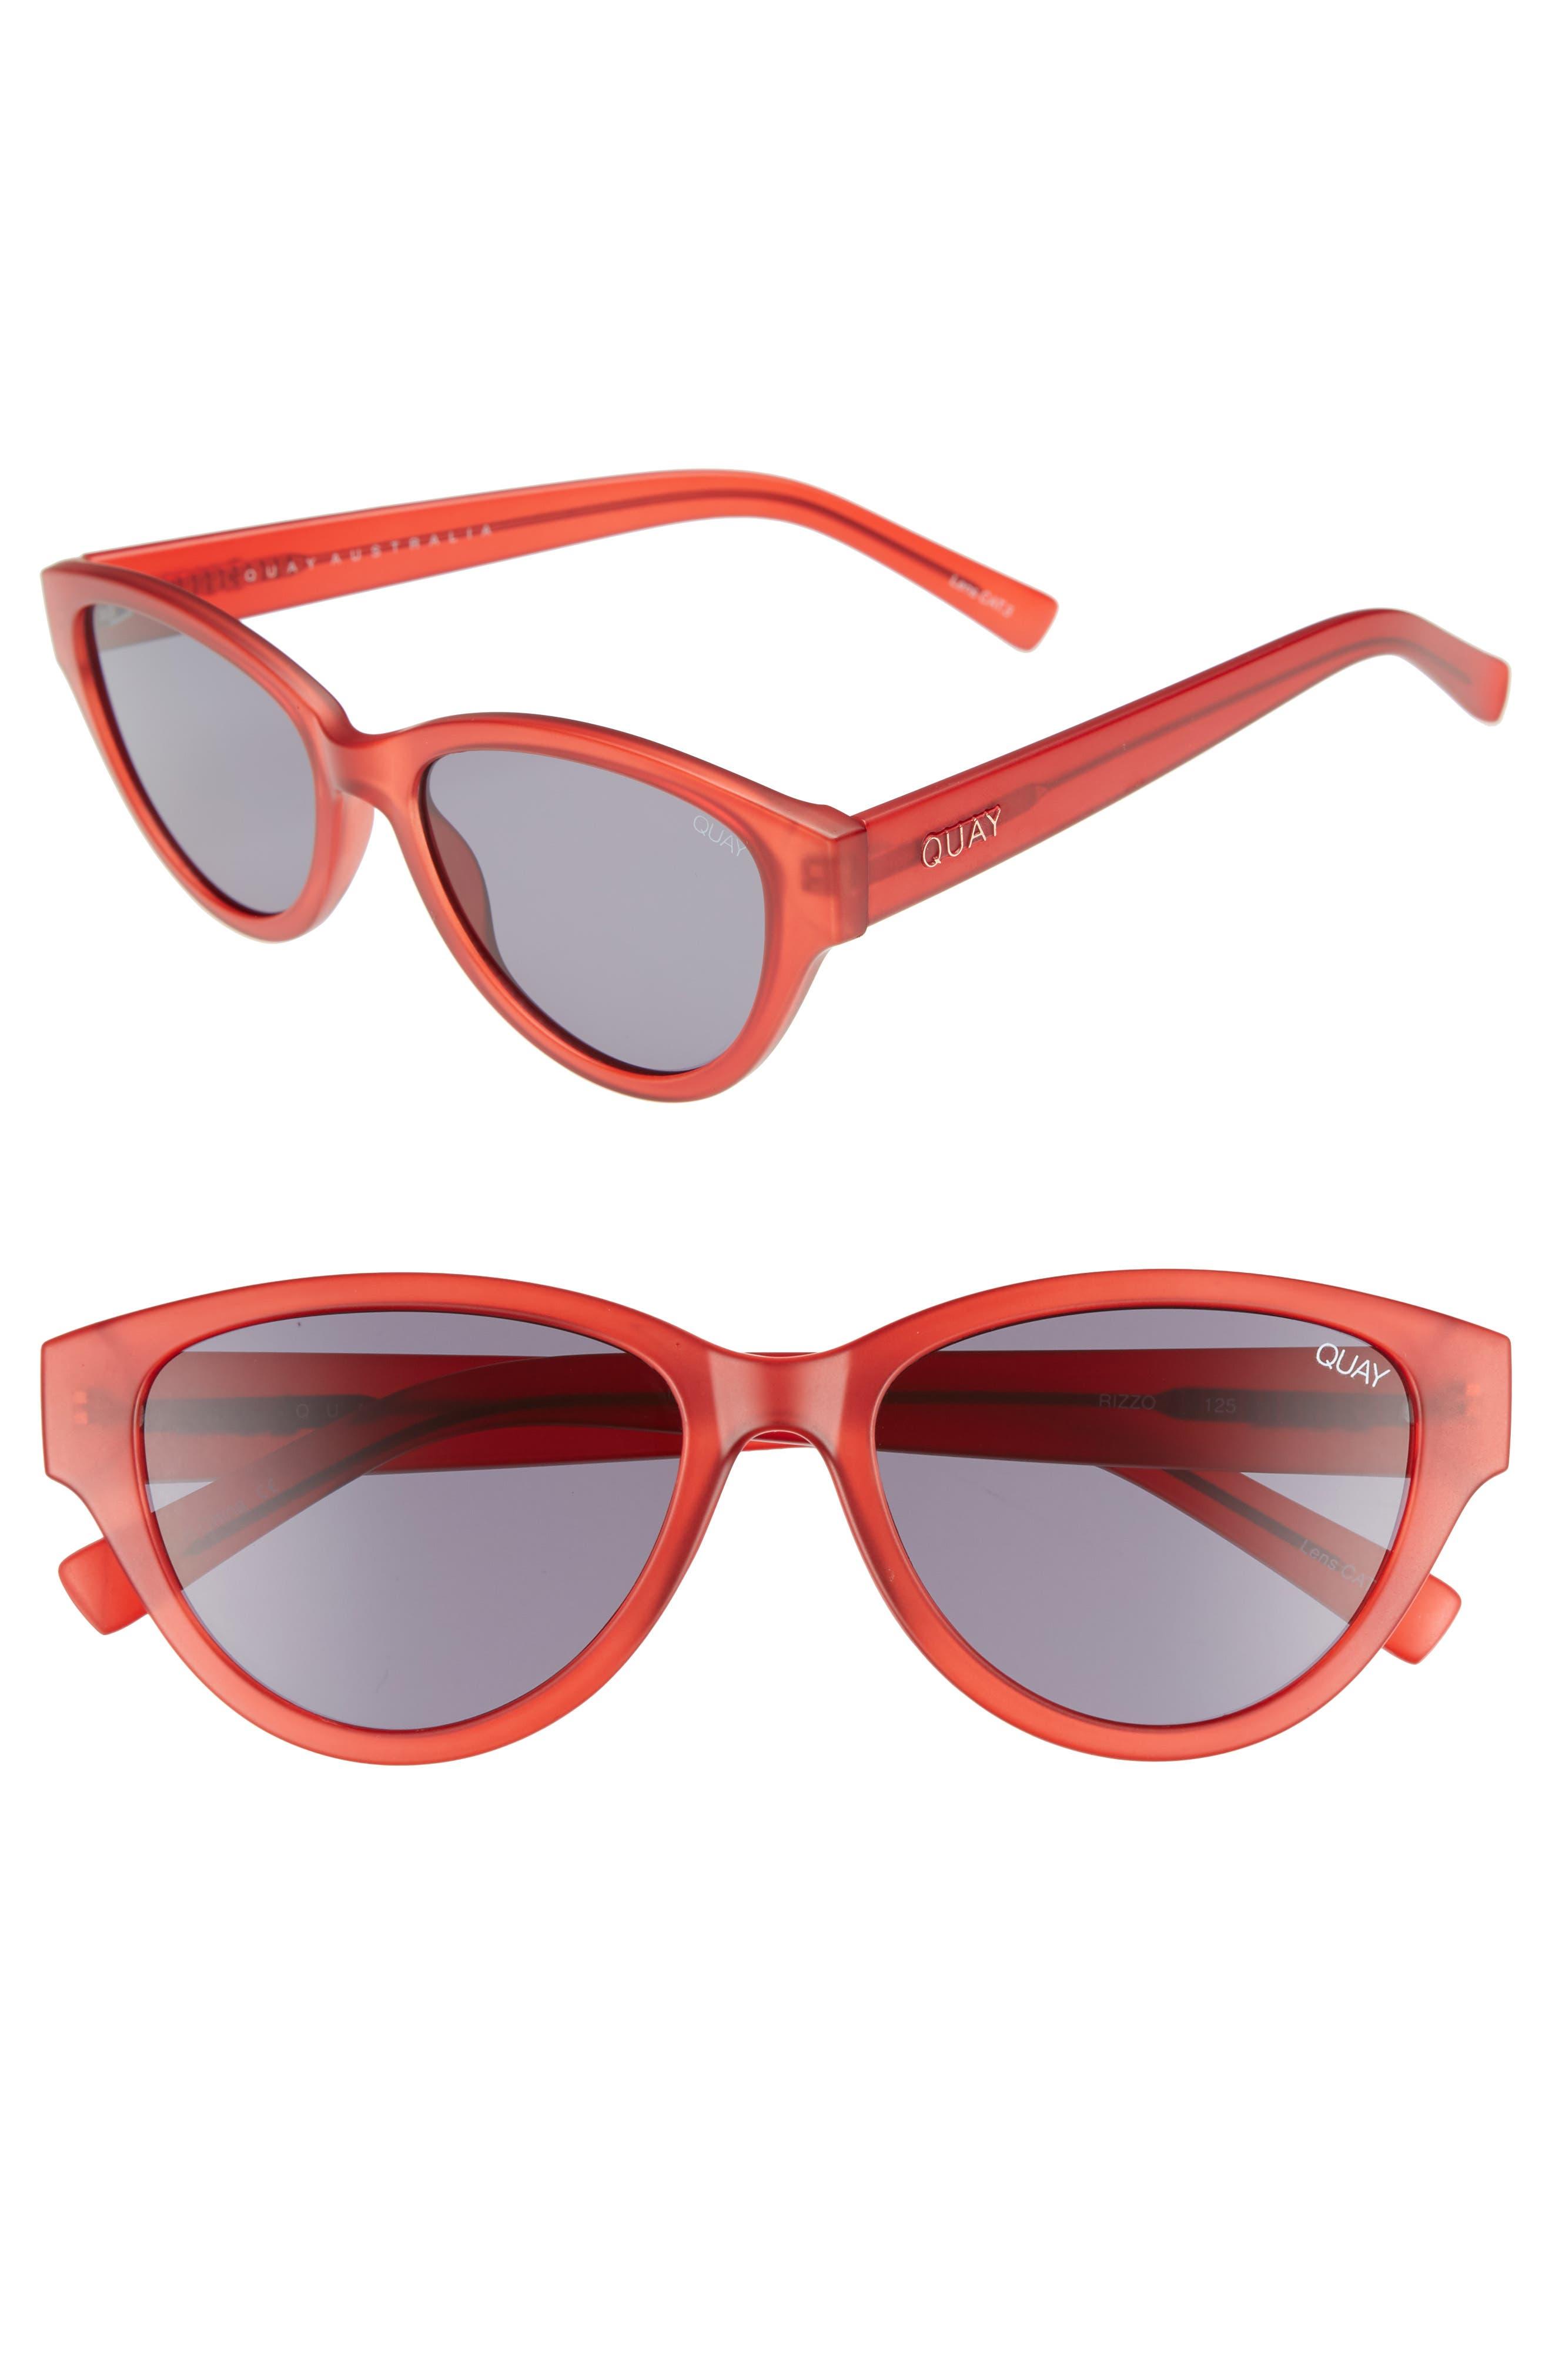 Rizzo 55mm Cat Eye Sunglasses,                             Main thumbnail 1, color,                             Red/ Smoke